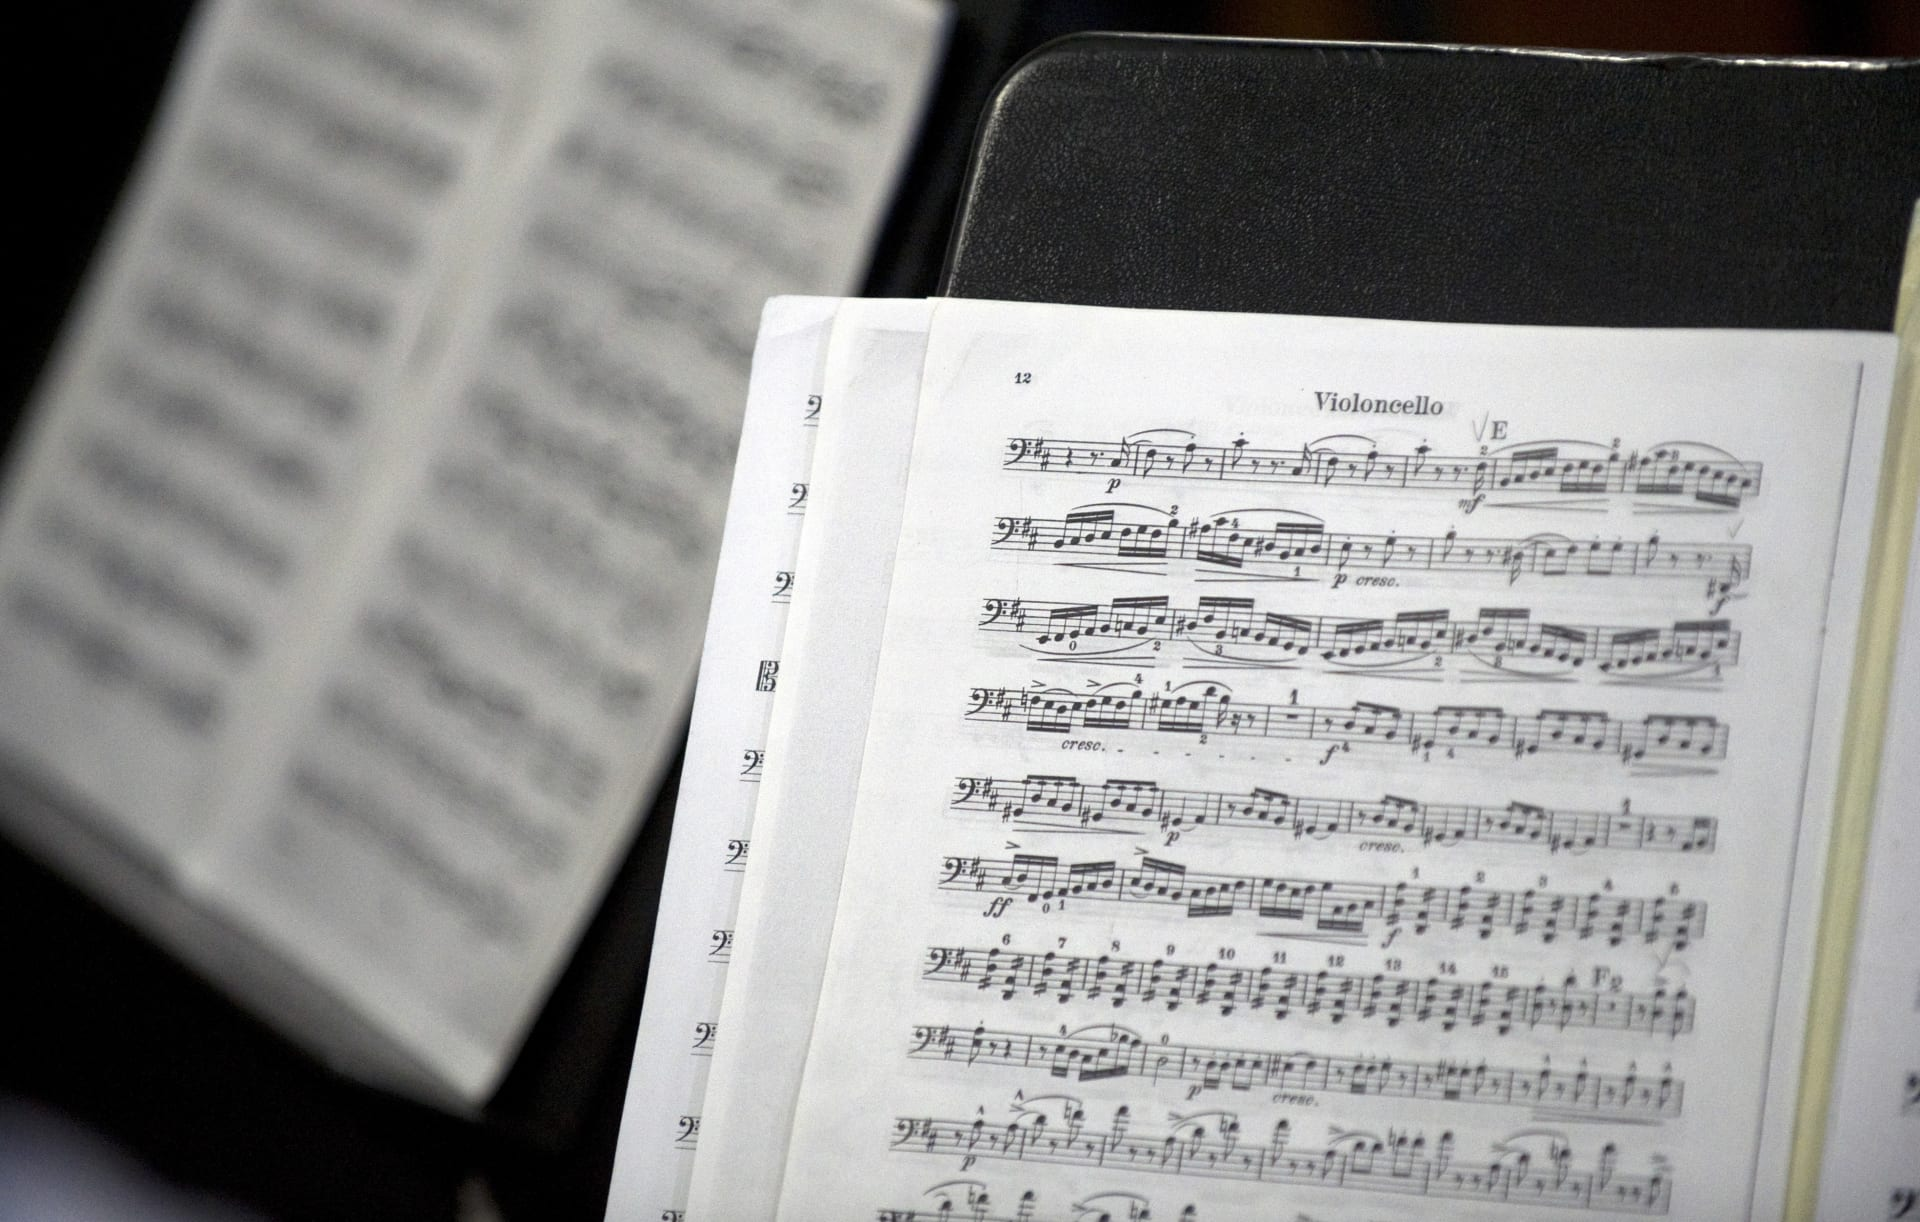 نص موسيقي في براغ يثير الشكوك حول عداوة بين موزارت وسالييري